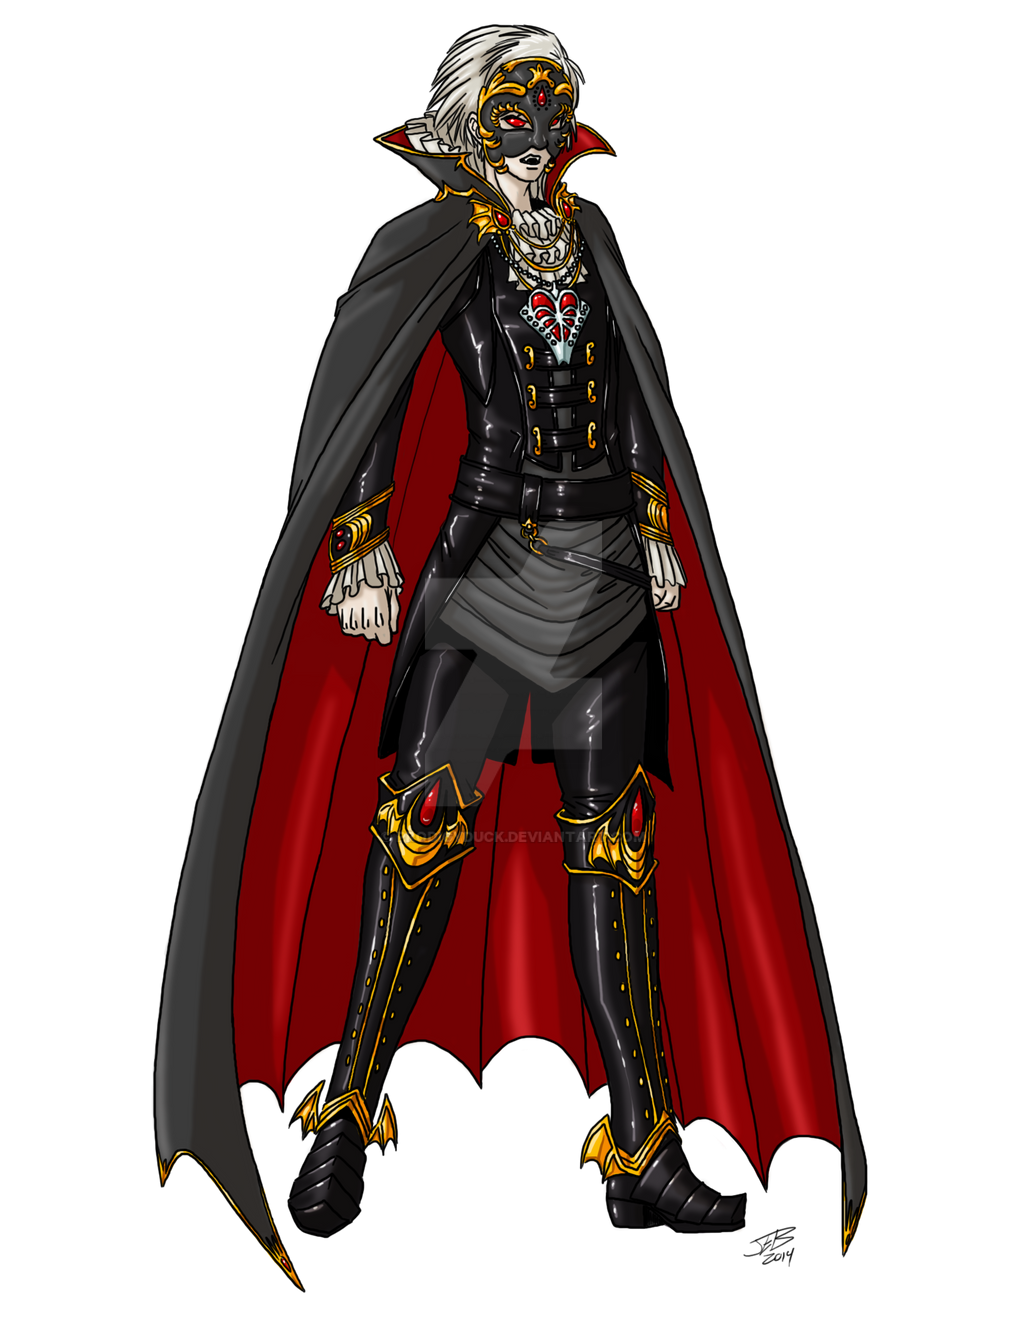 Cultus Sangineus Masked by ProdigyDuck